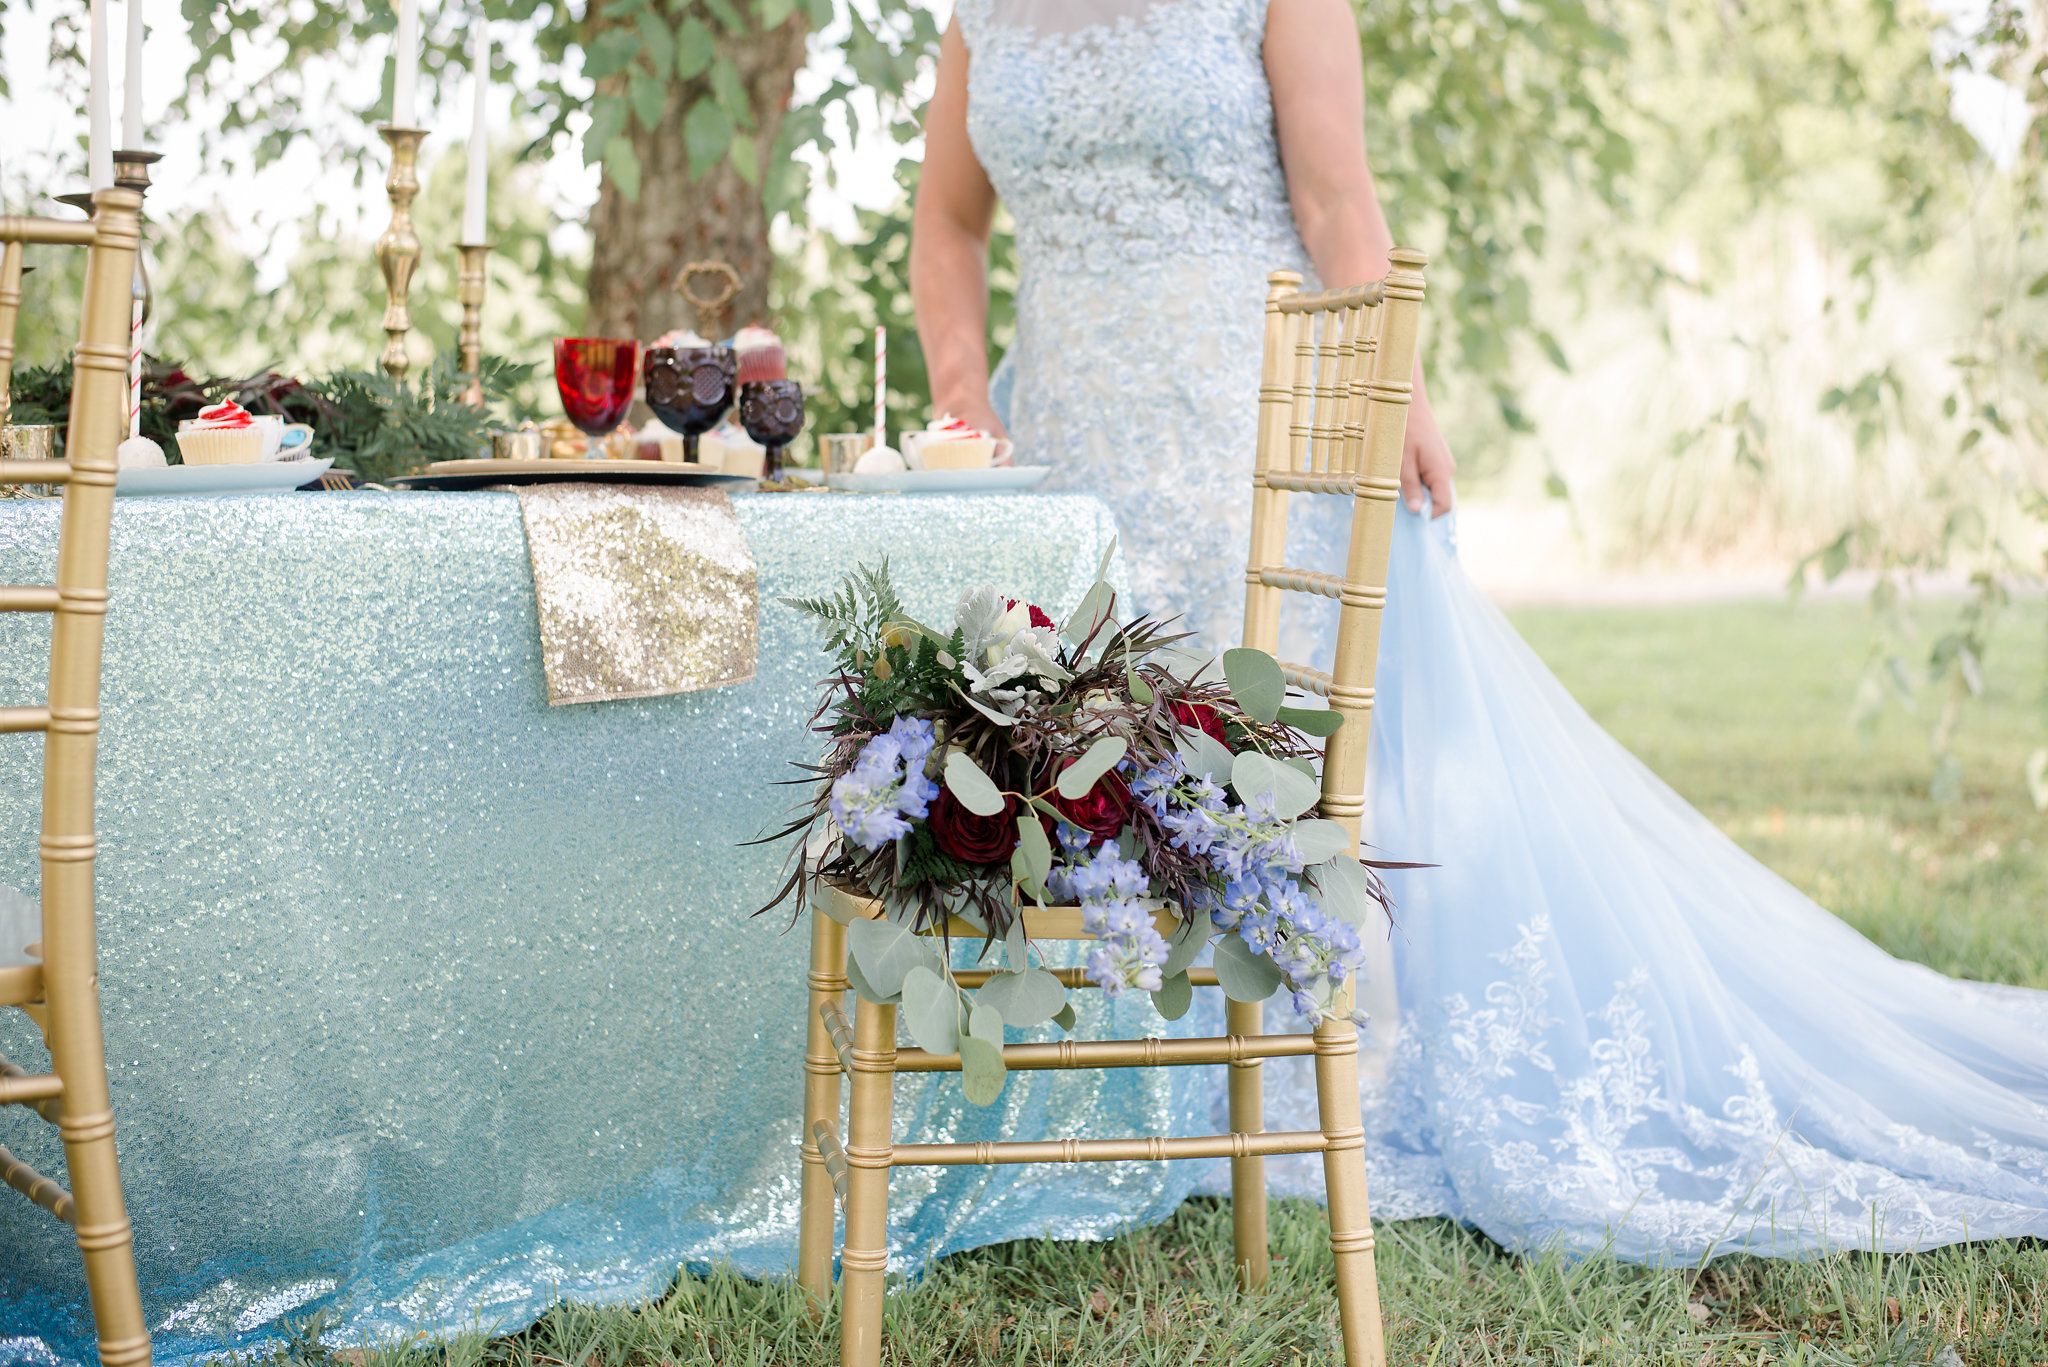 elizabeth-hayden-photography-wedding-arkansas-6097.jpg